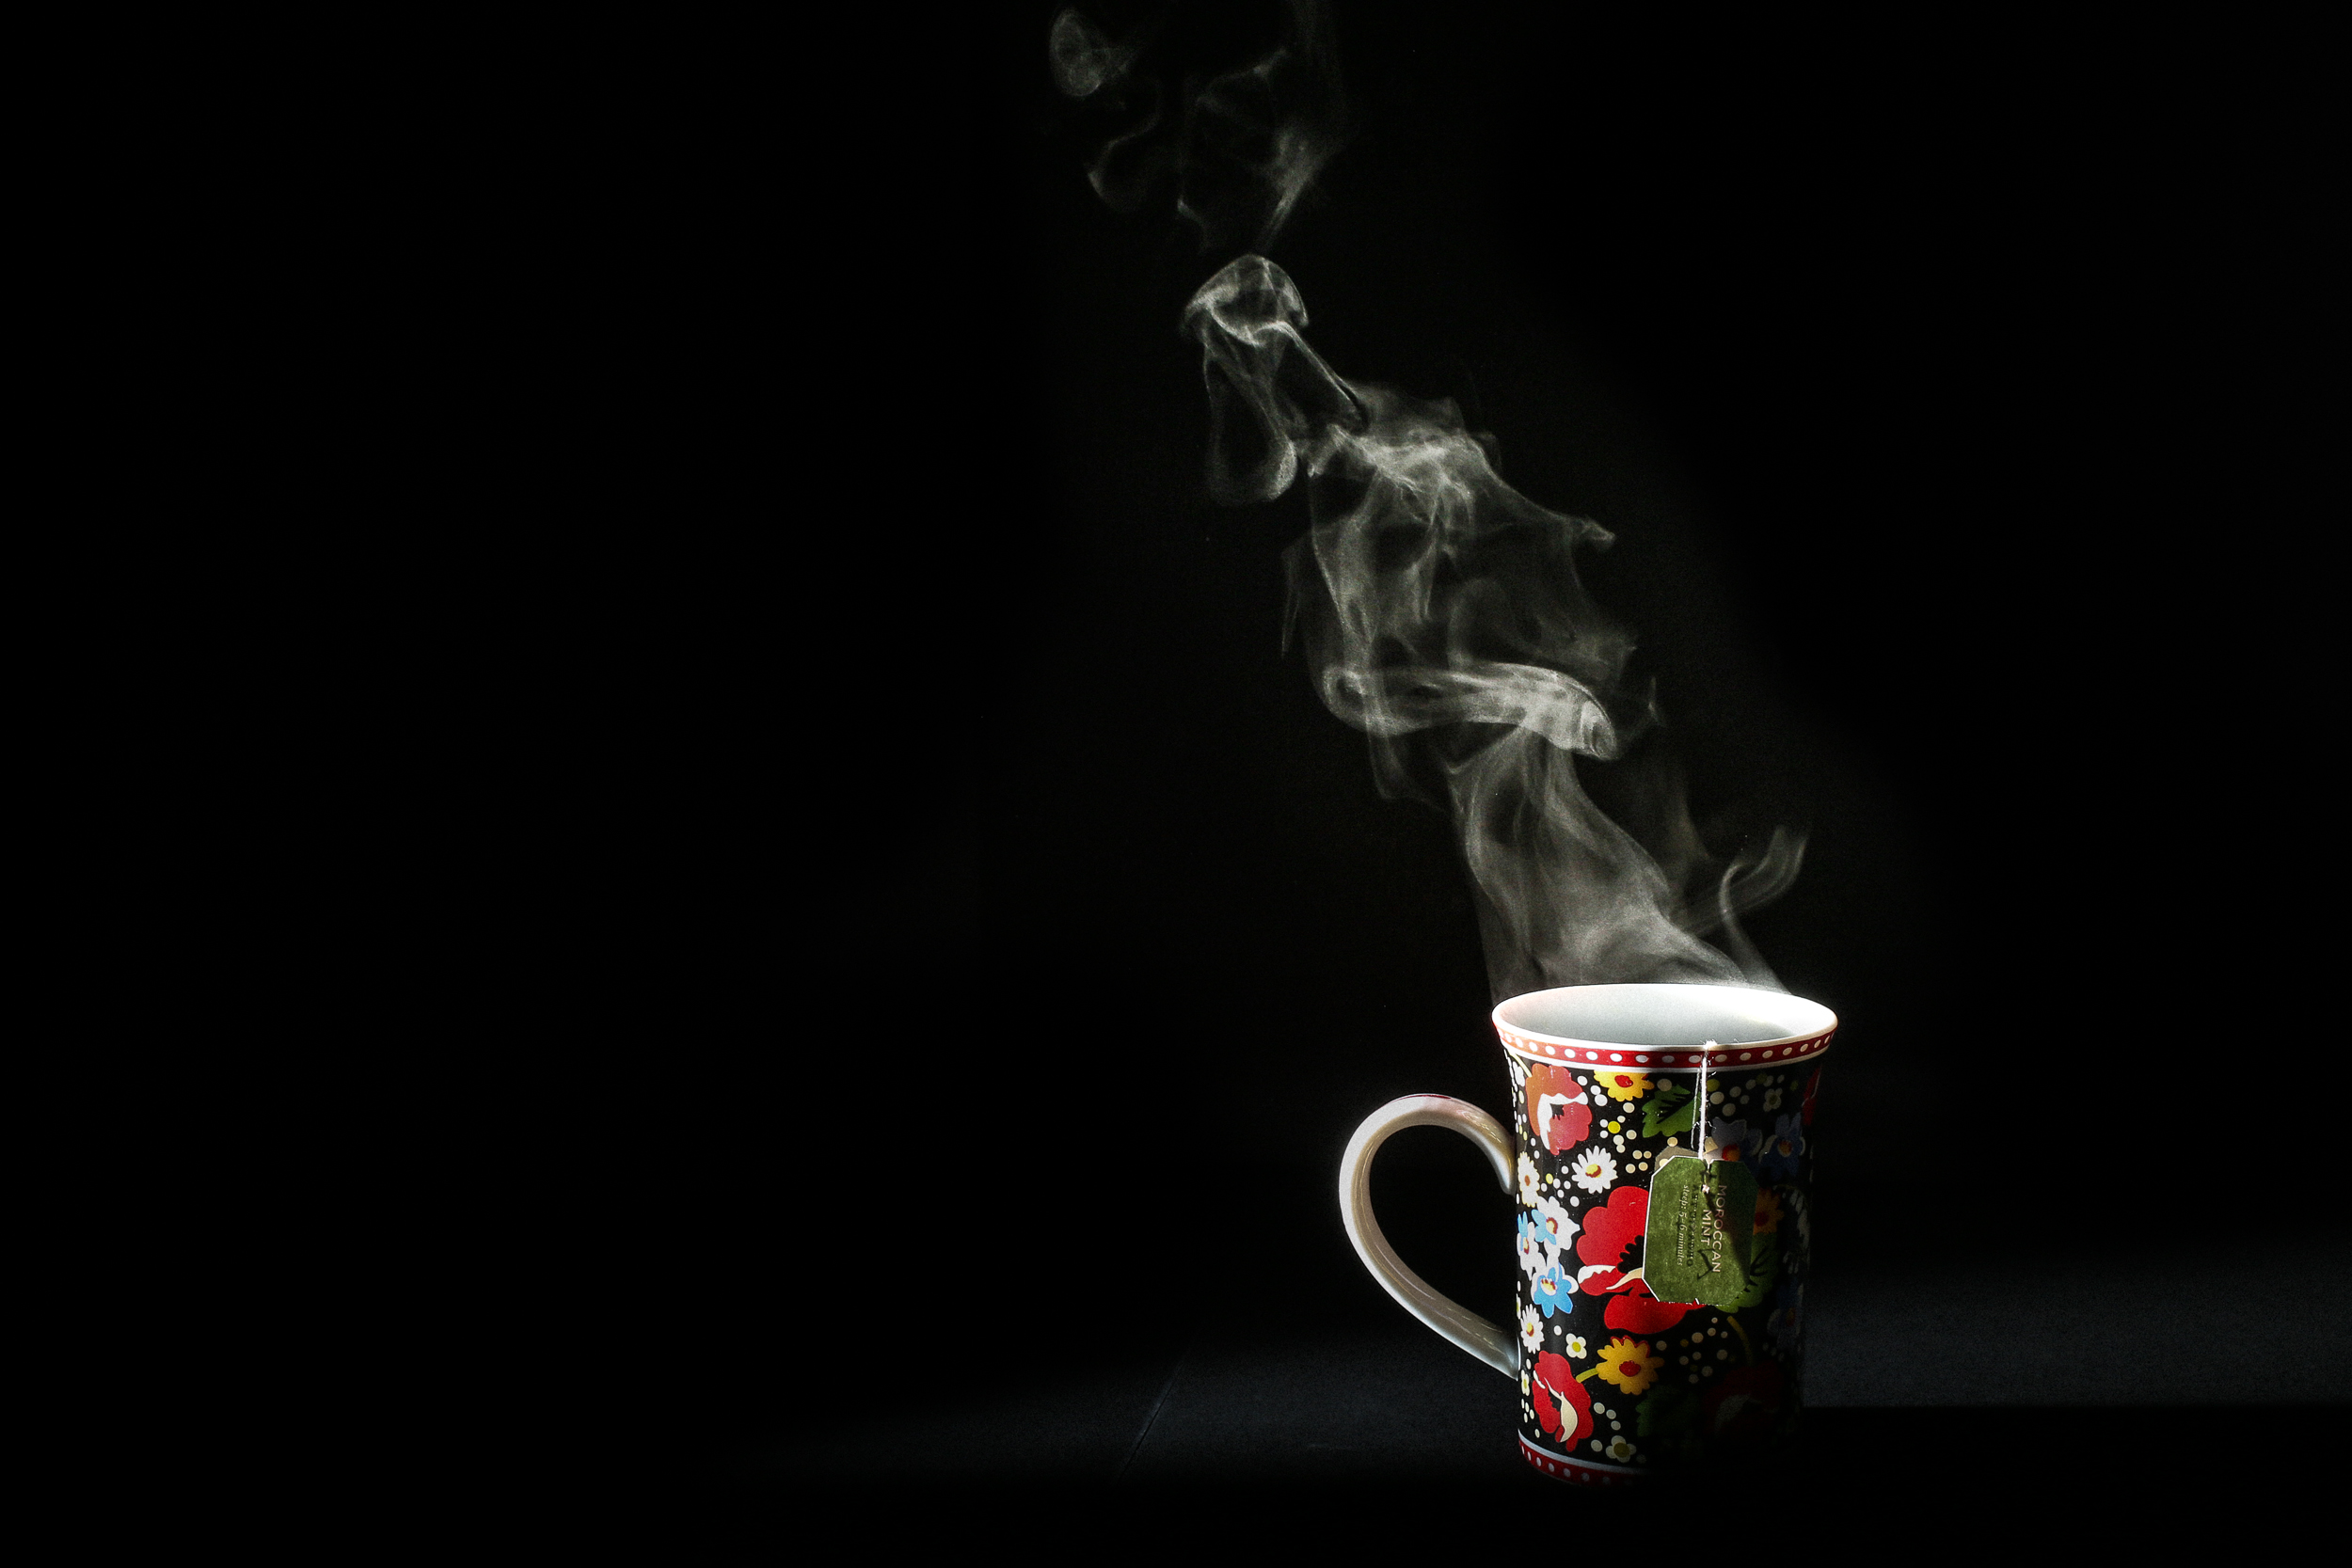 Water. Tea. Steam.